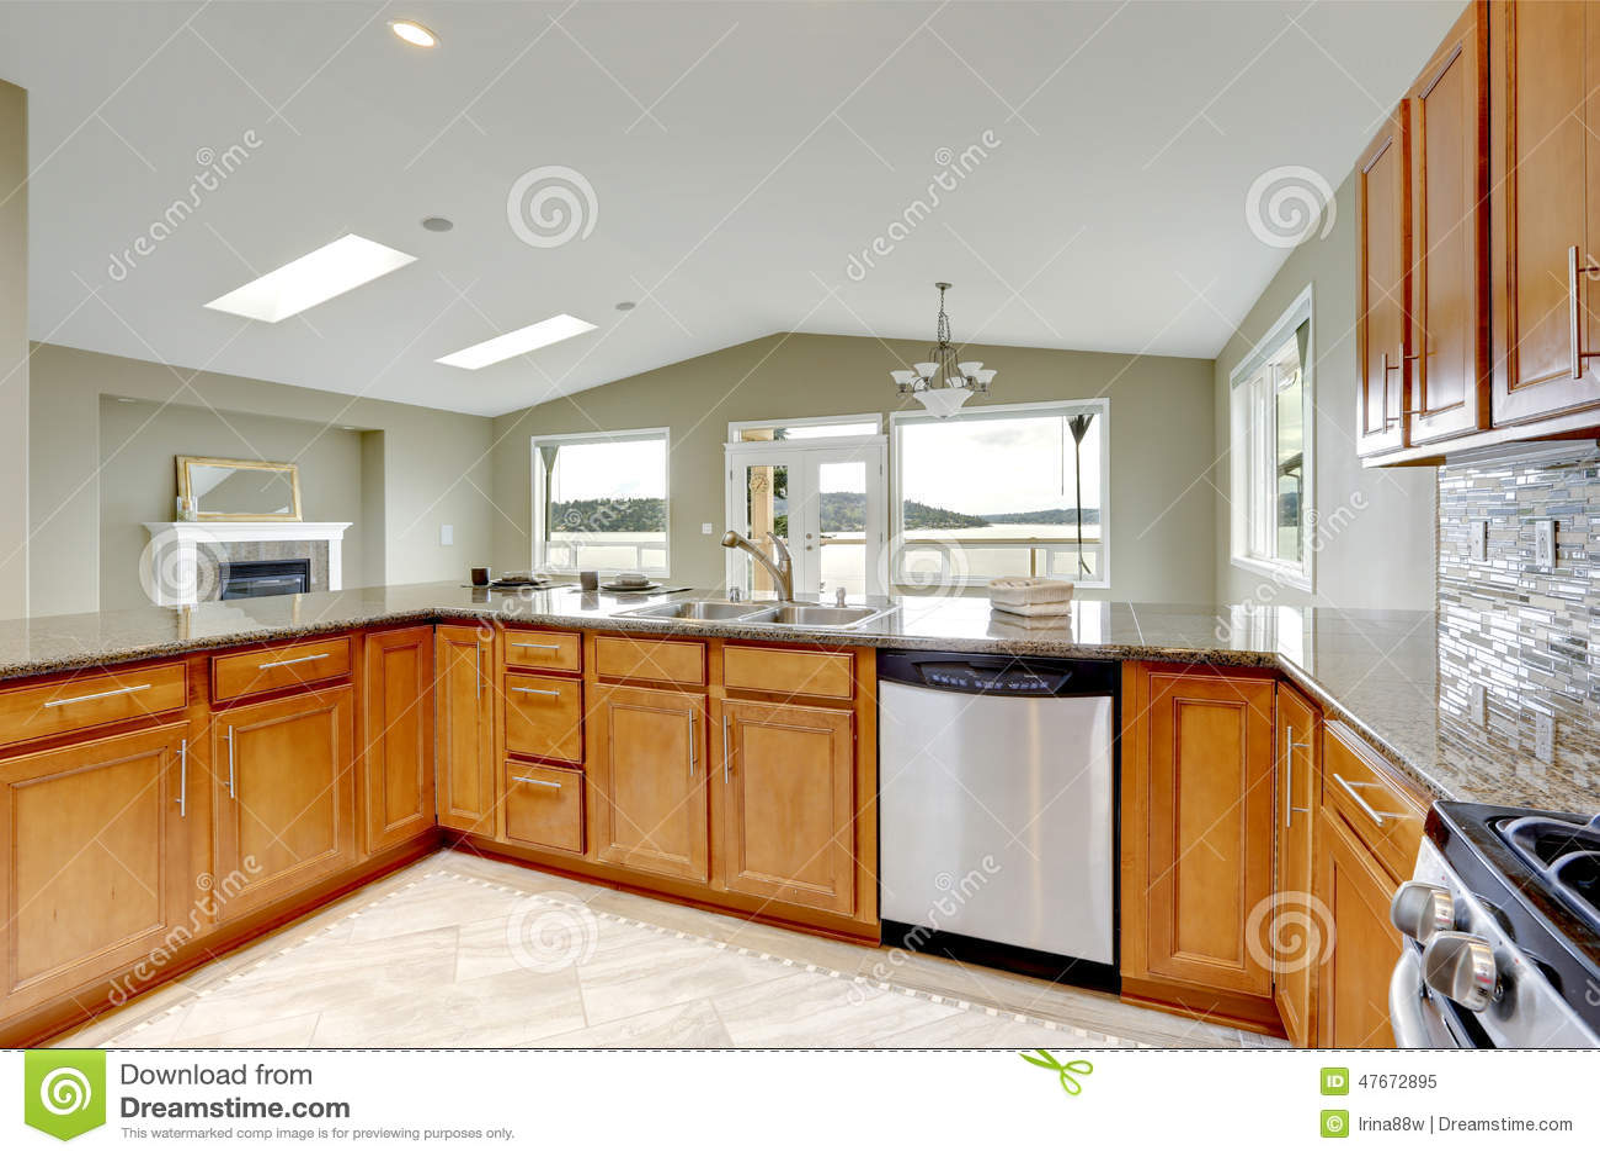 Muebles de cocina neftali obtenga ideas dise o de for Cocinas de lujo madrid